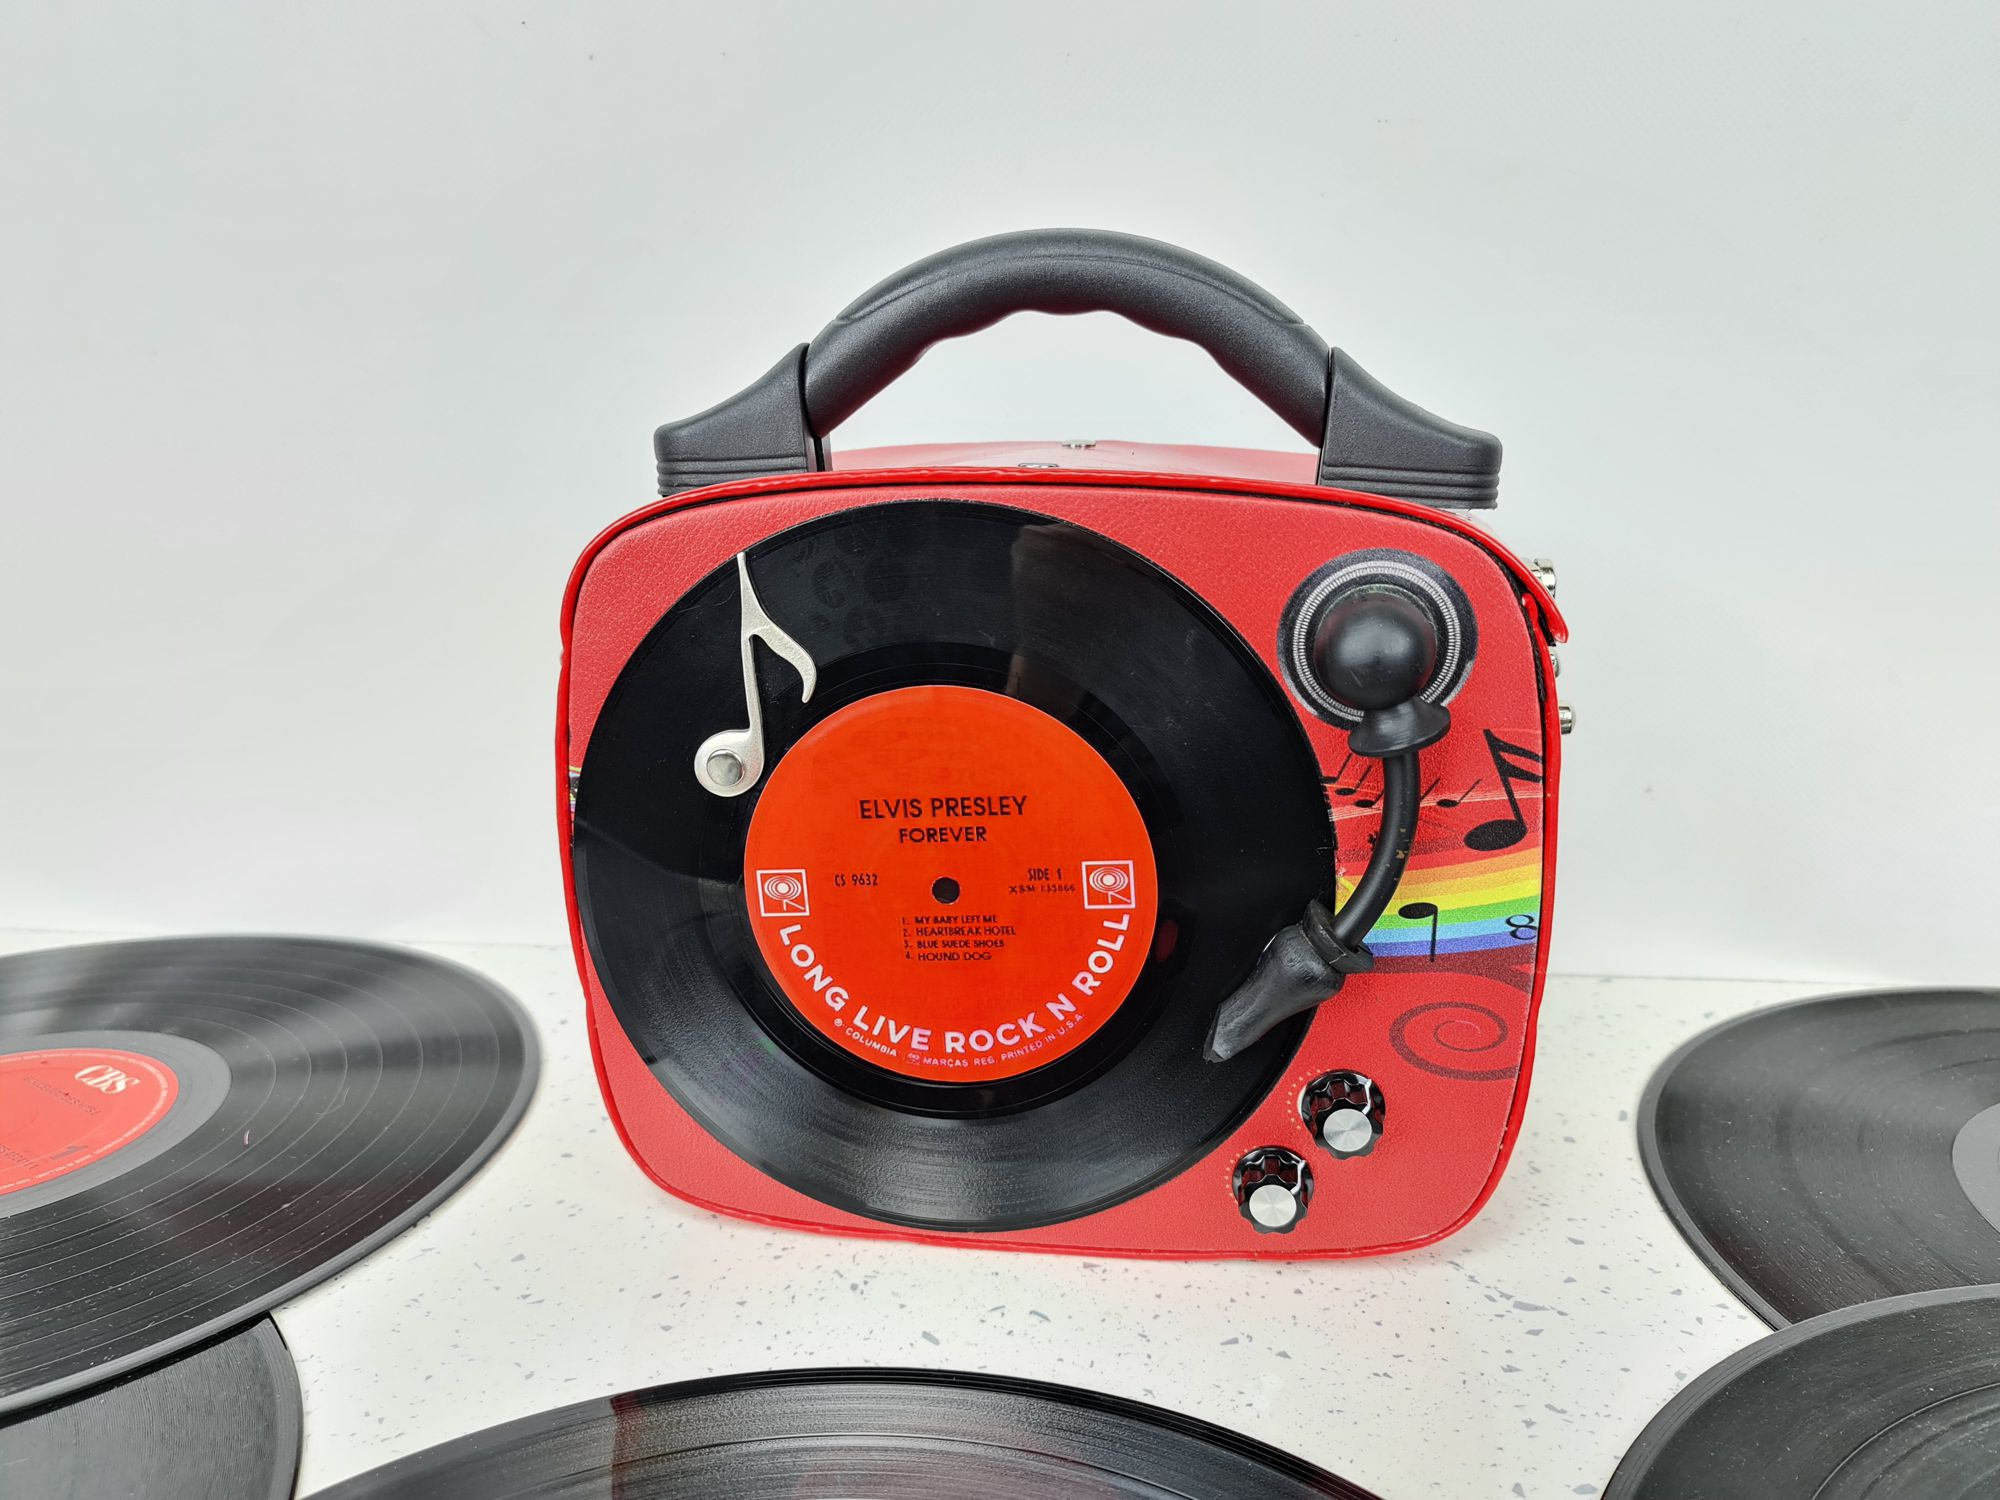 BA018_sac-a-main-pin-up-rockabilly-retro-rocknroll-tourne-disque